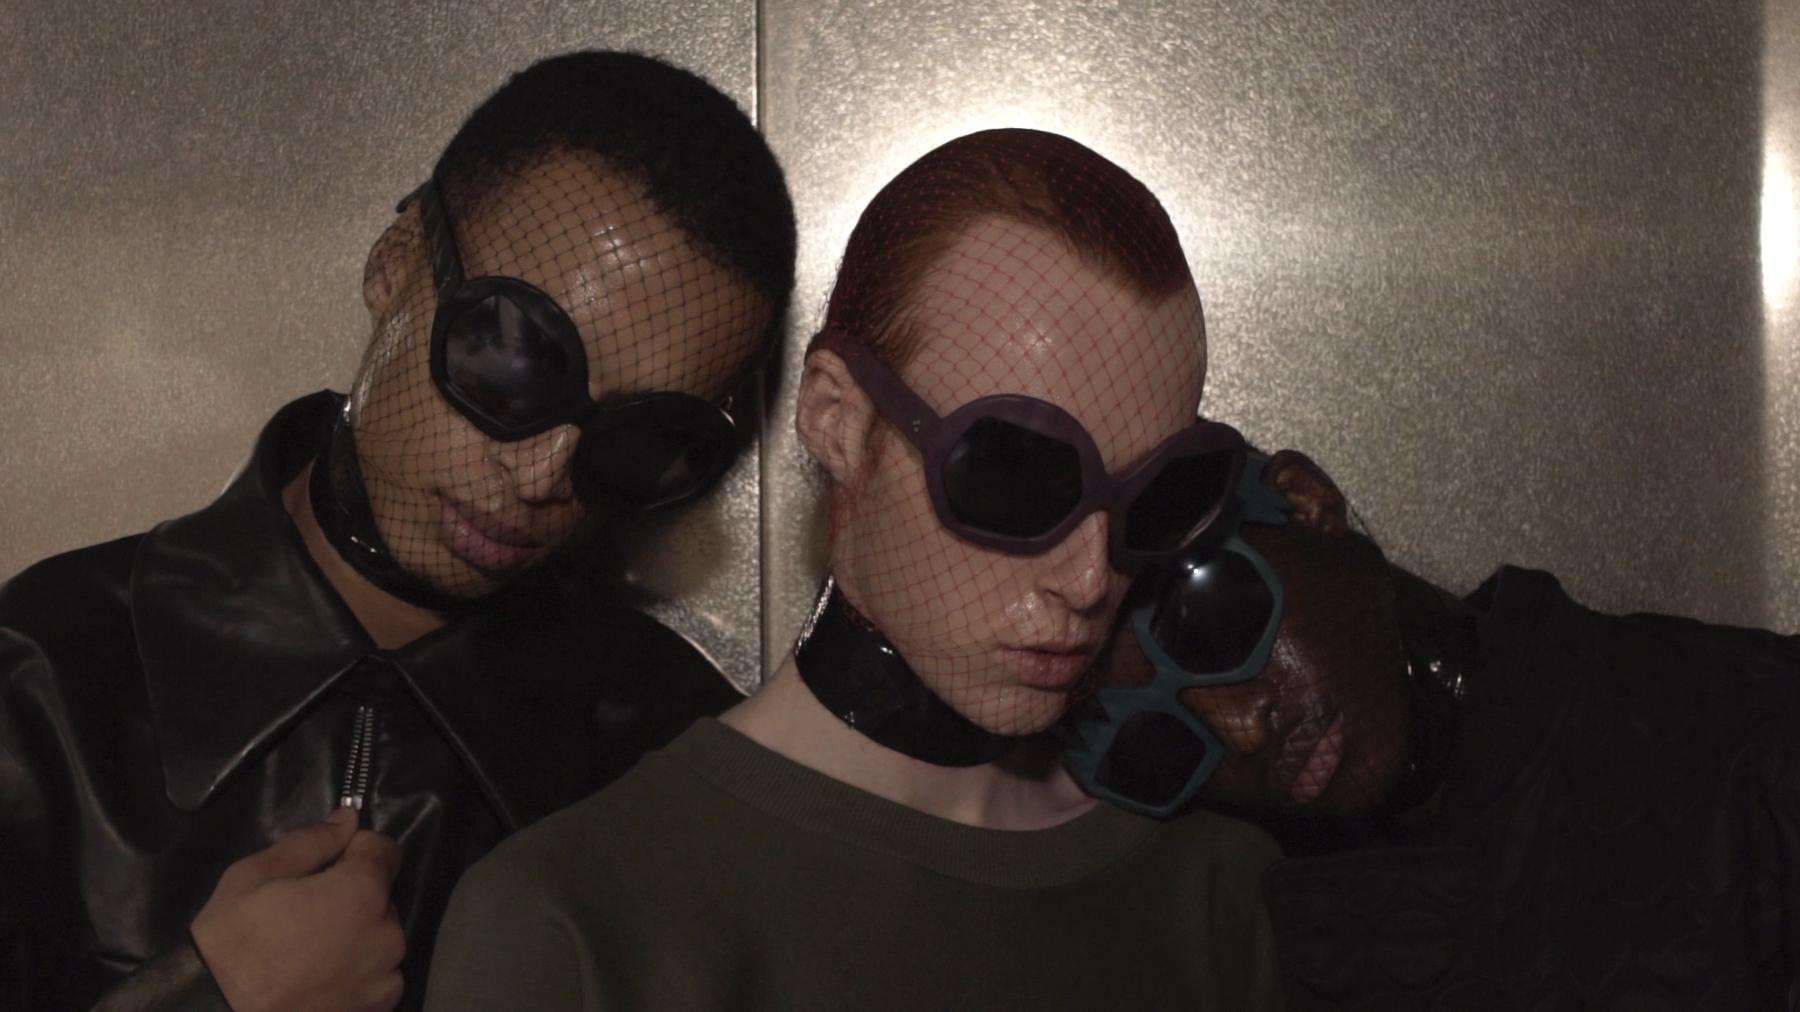 FAKBYFAK x Walter Van Beirendonck  Donder Sunglasses. Black Code: FBF-09-14-01